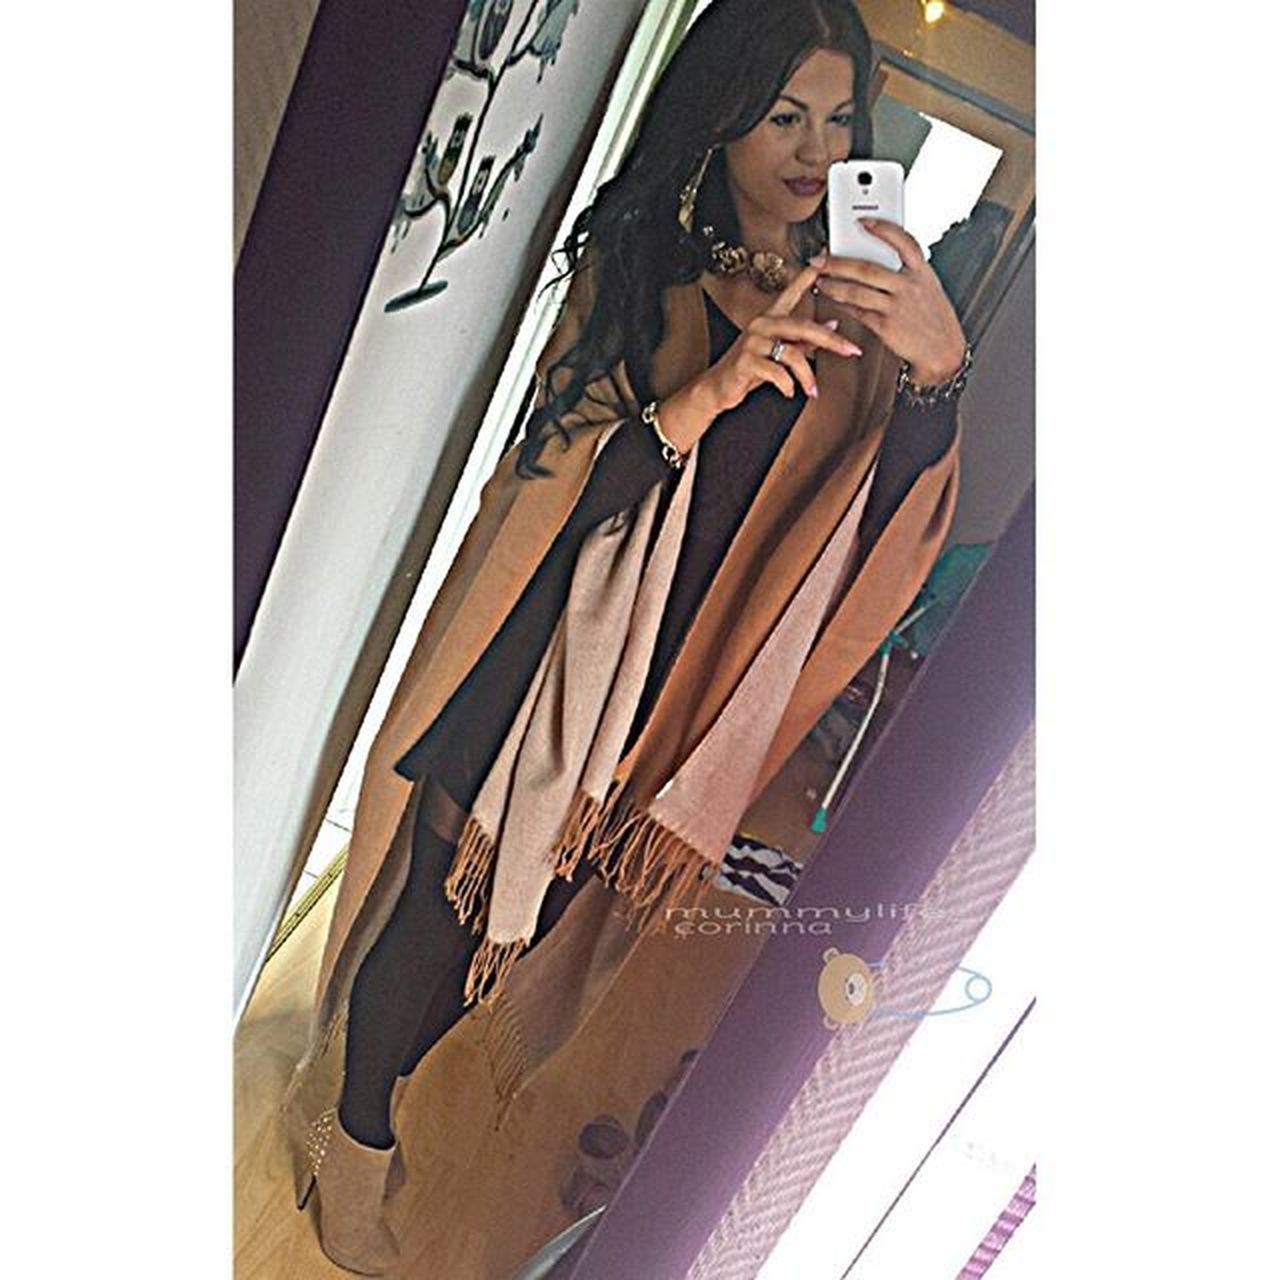 Das Geheimnis einer liebe besteht darin die Person immer noch zu wollen, obwohl man sie bereits hat.❤💋 Fashionmom Blogger Momlife HighHeels Filter Hairstyle Longhair Photographer Piercing Ink Fashionable Makeup Selfie Fashionlover Outfitoftheday Ootd Stylish Hairstyles Curlyhair Creative Fashion Fitness Fashionblogger Nails Poncho